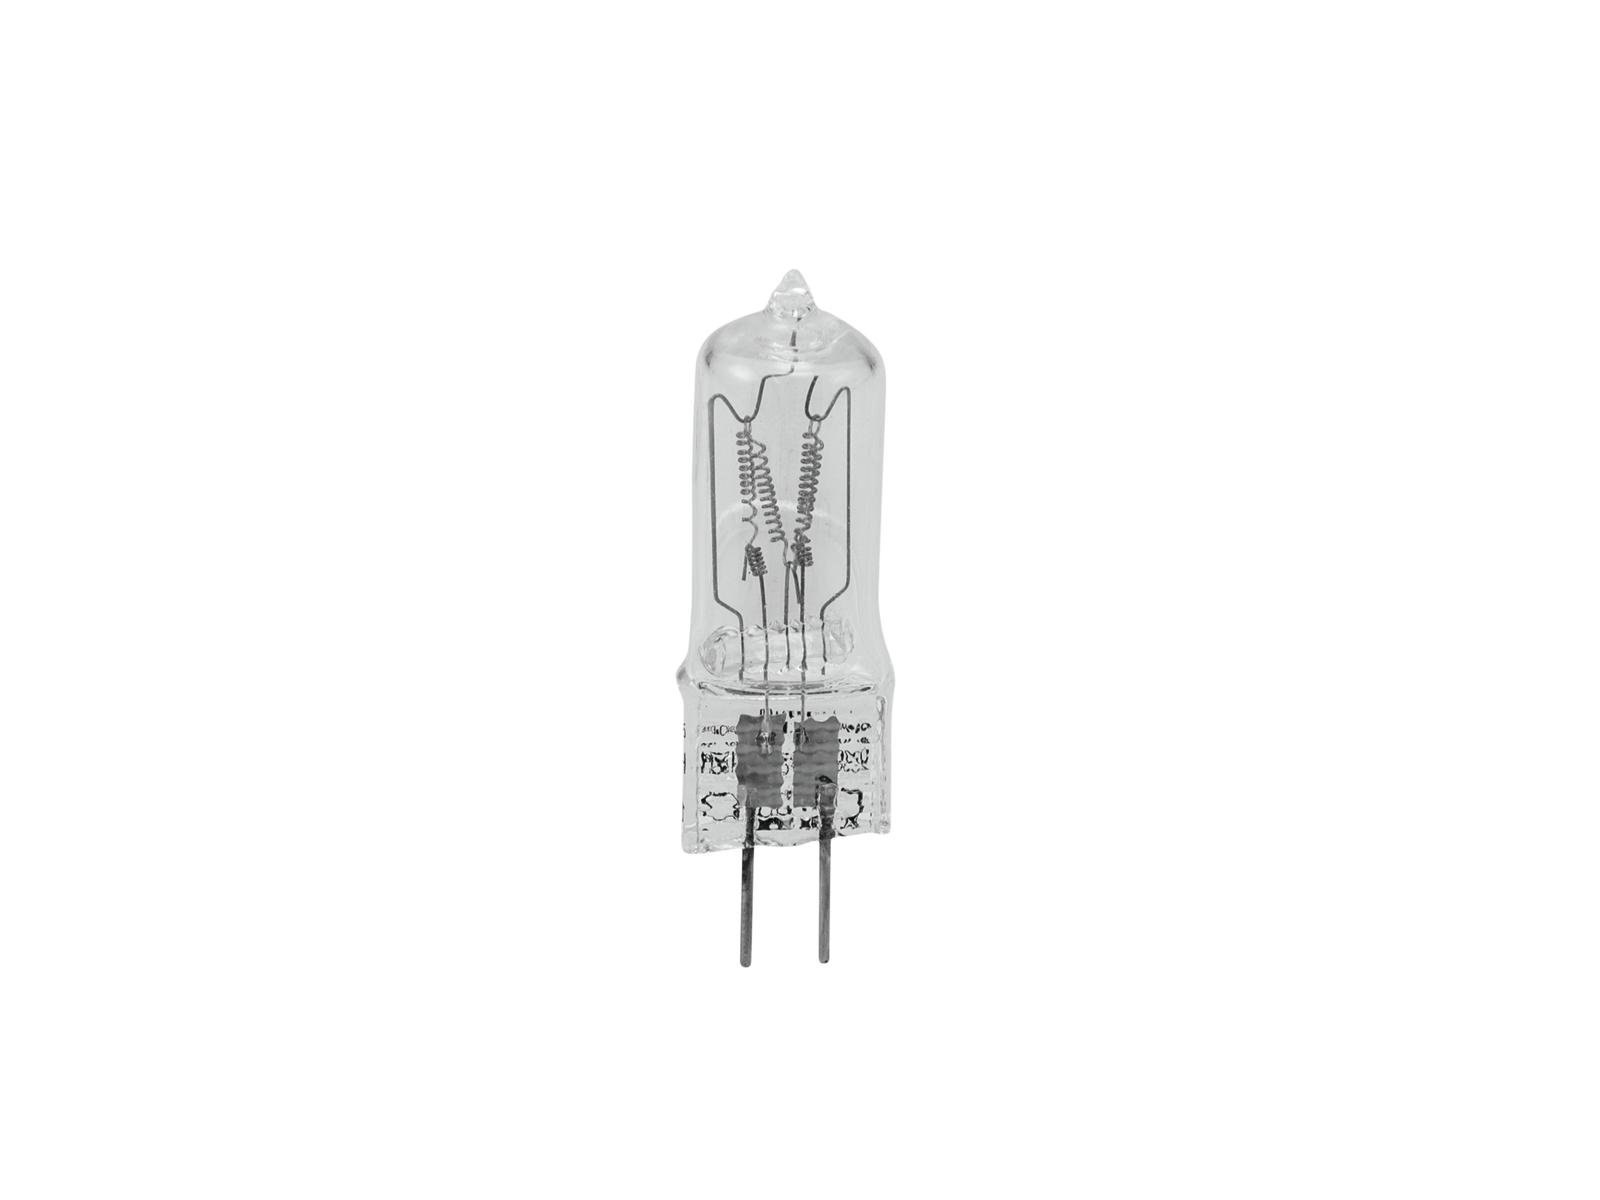 230V/300W GX-6,35 75h 3200K Omnilux